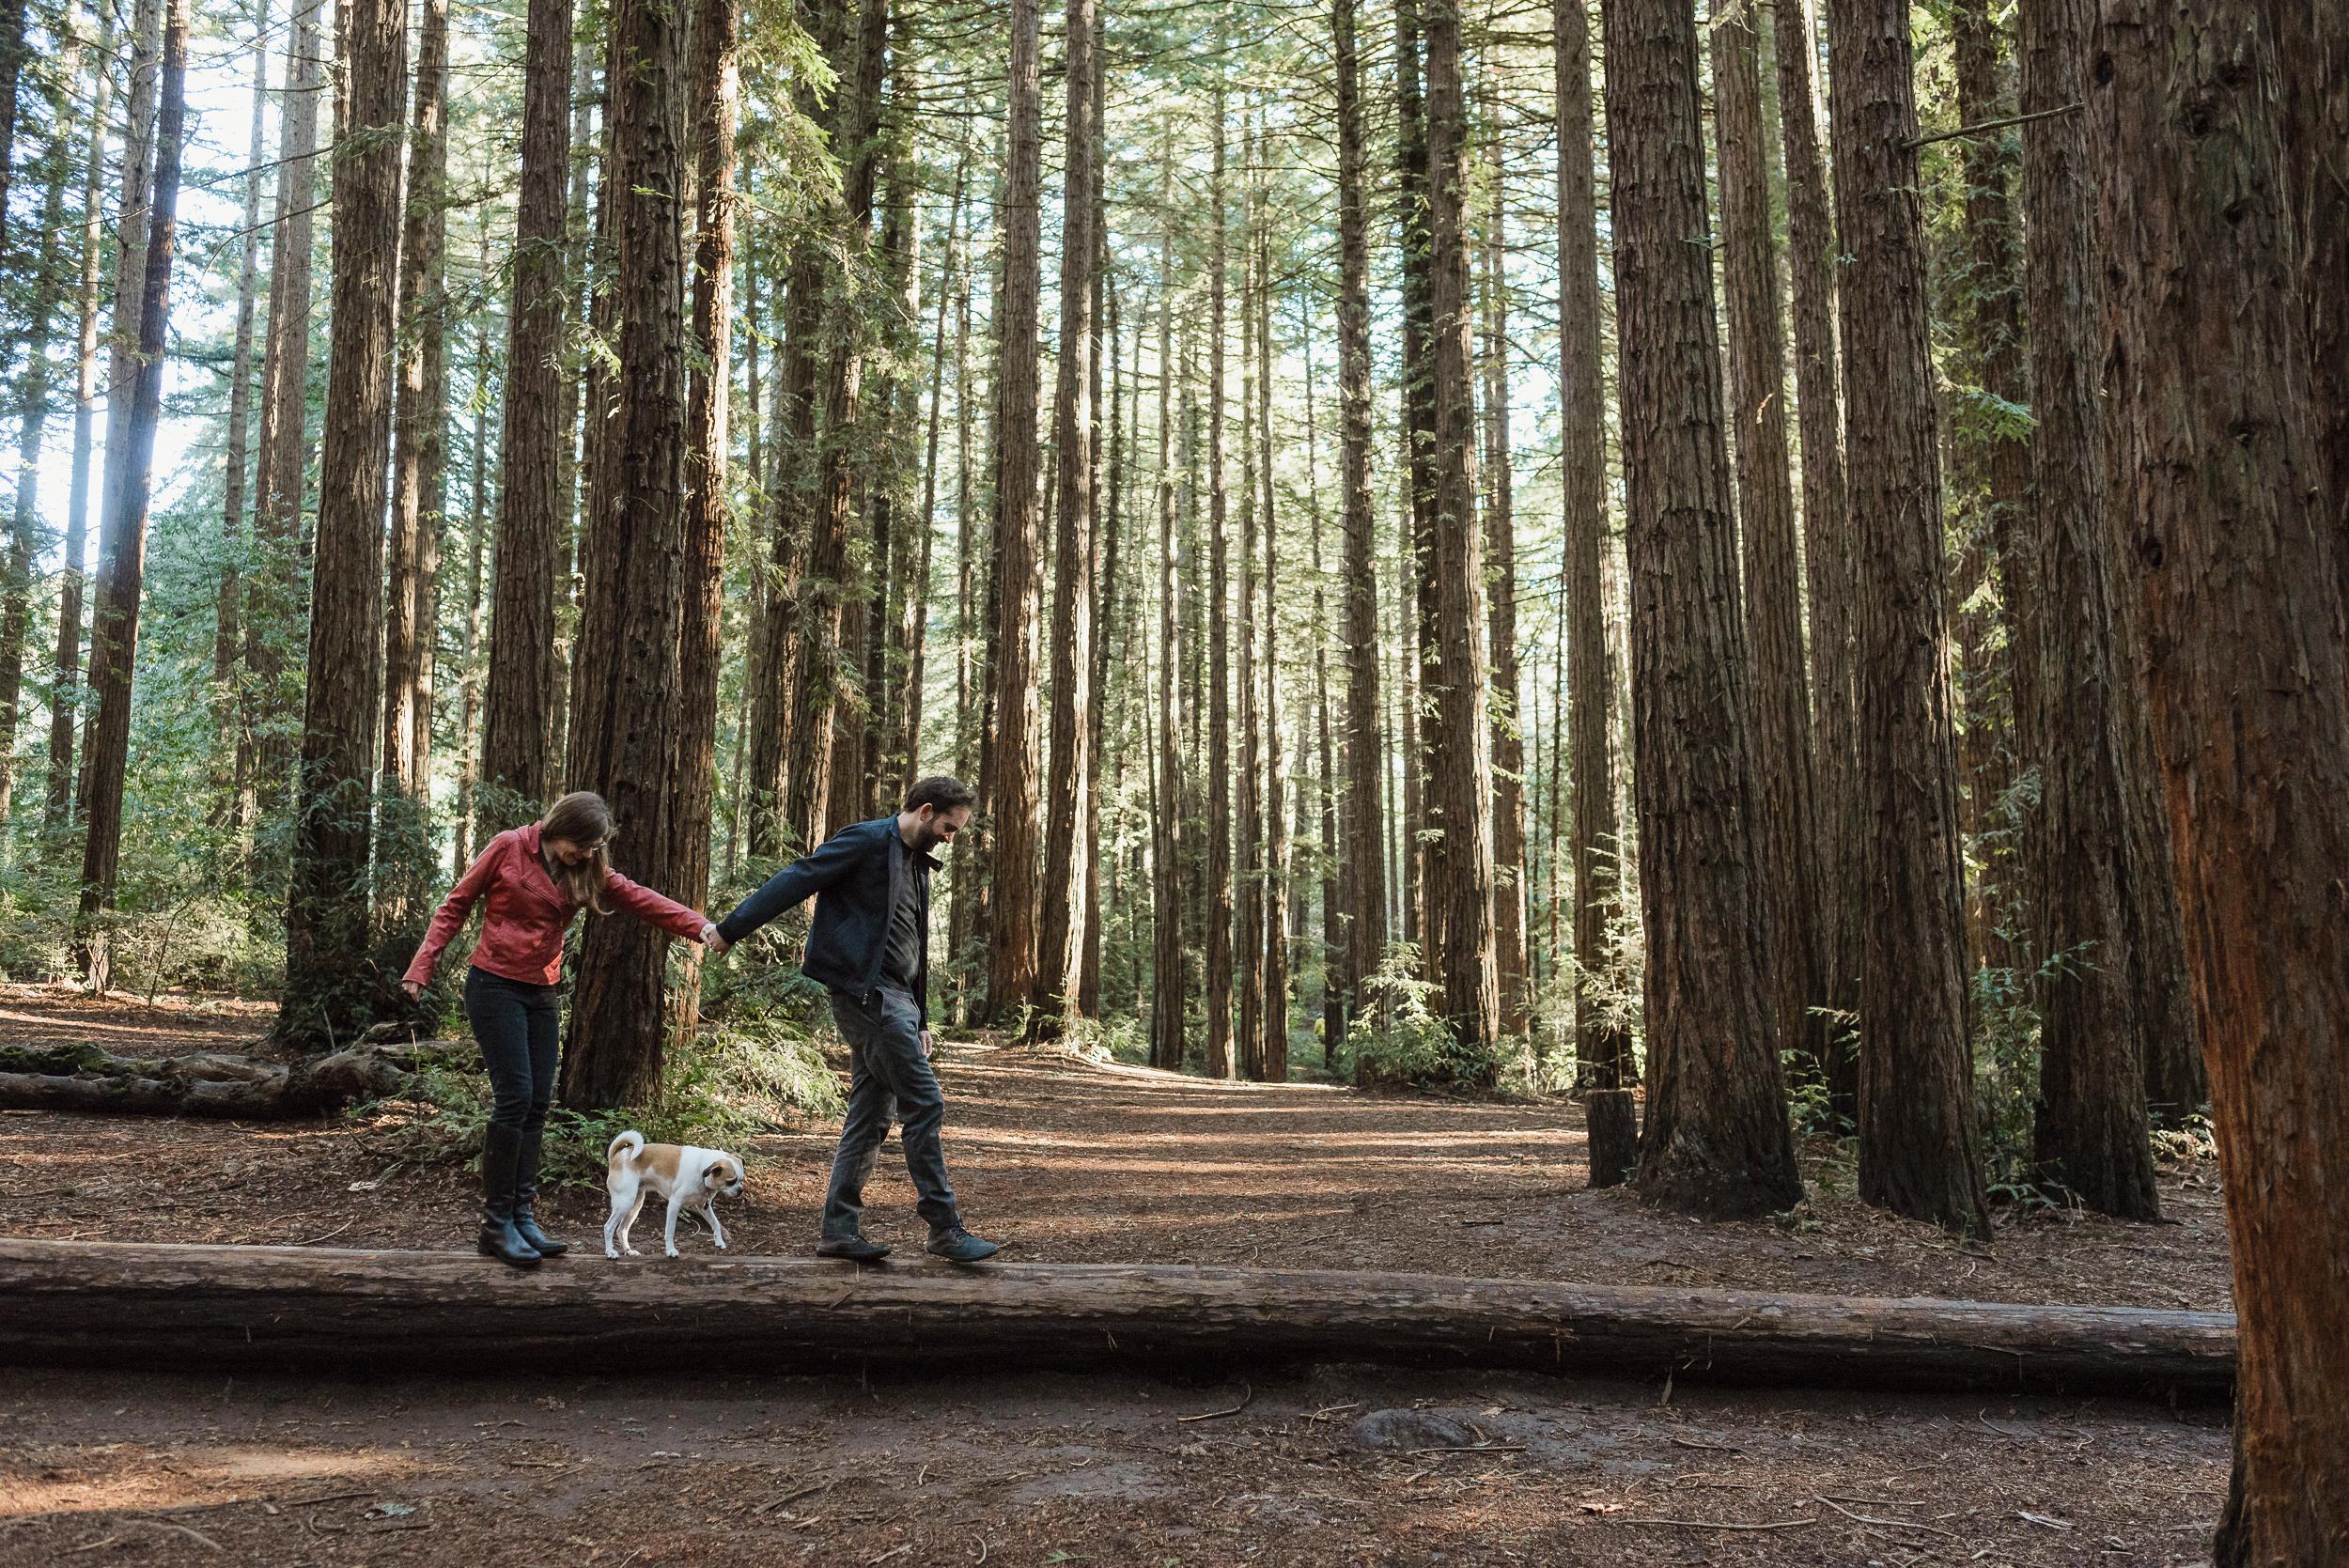 oakland-joaquin-miller-park-redwood-grove-engagement-session-vivianchen-019.jpg